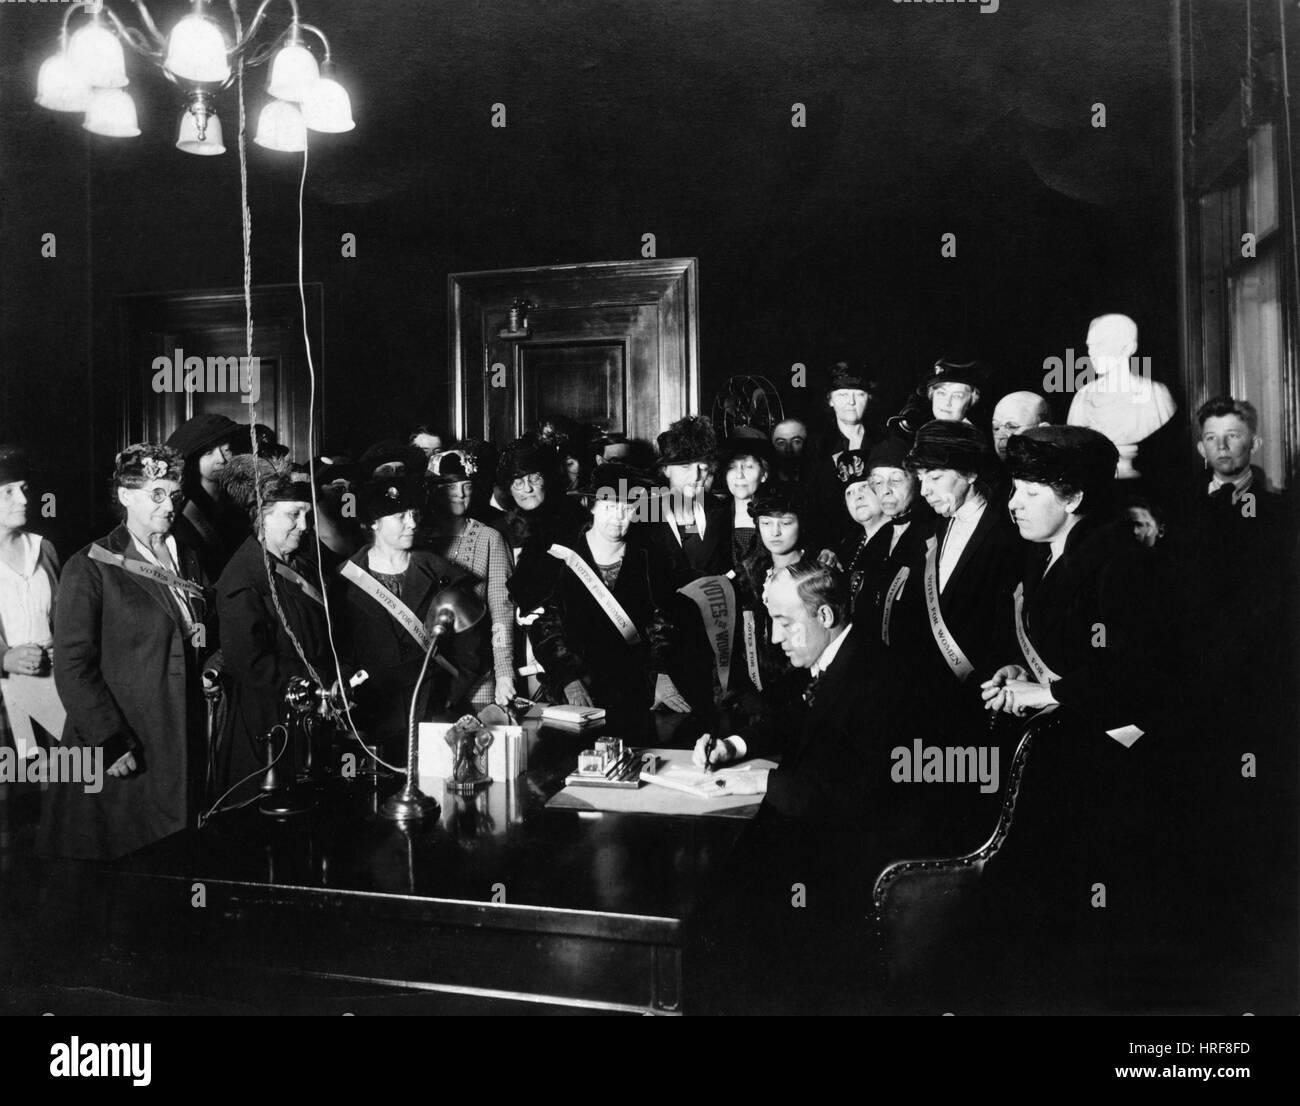 Nineteenth Amendment Signing - Stock Image